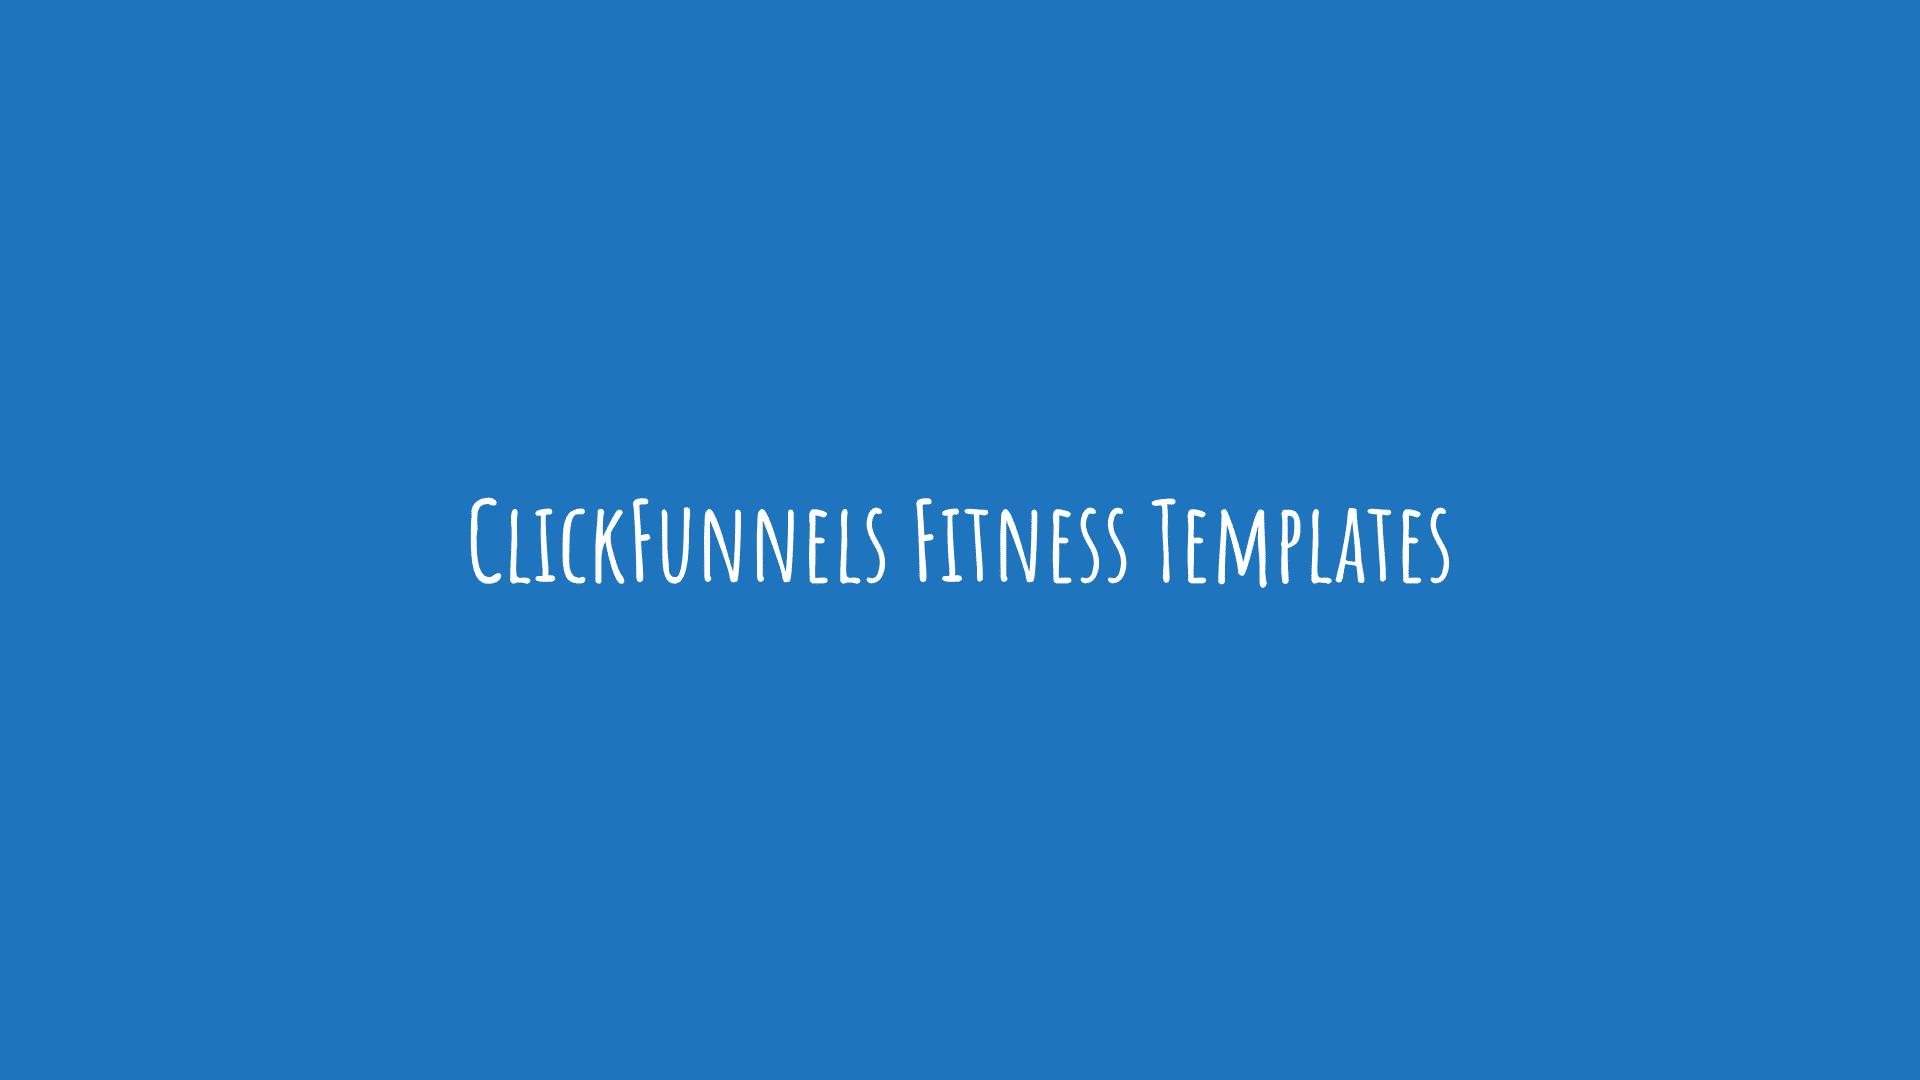 ClickFunnels Fitness Templates